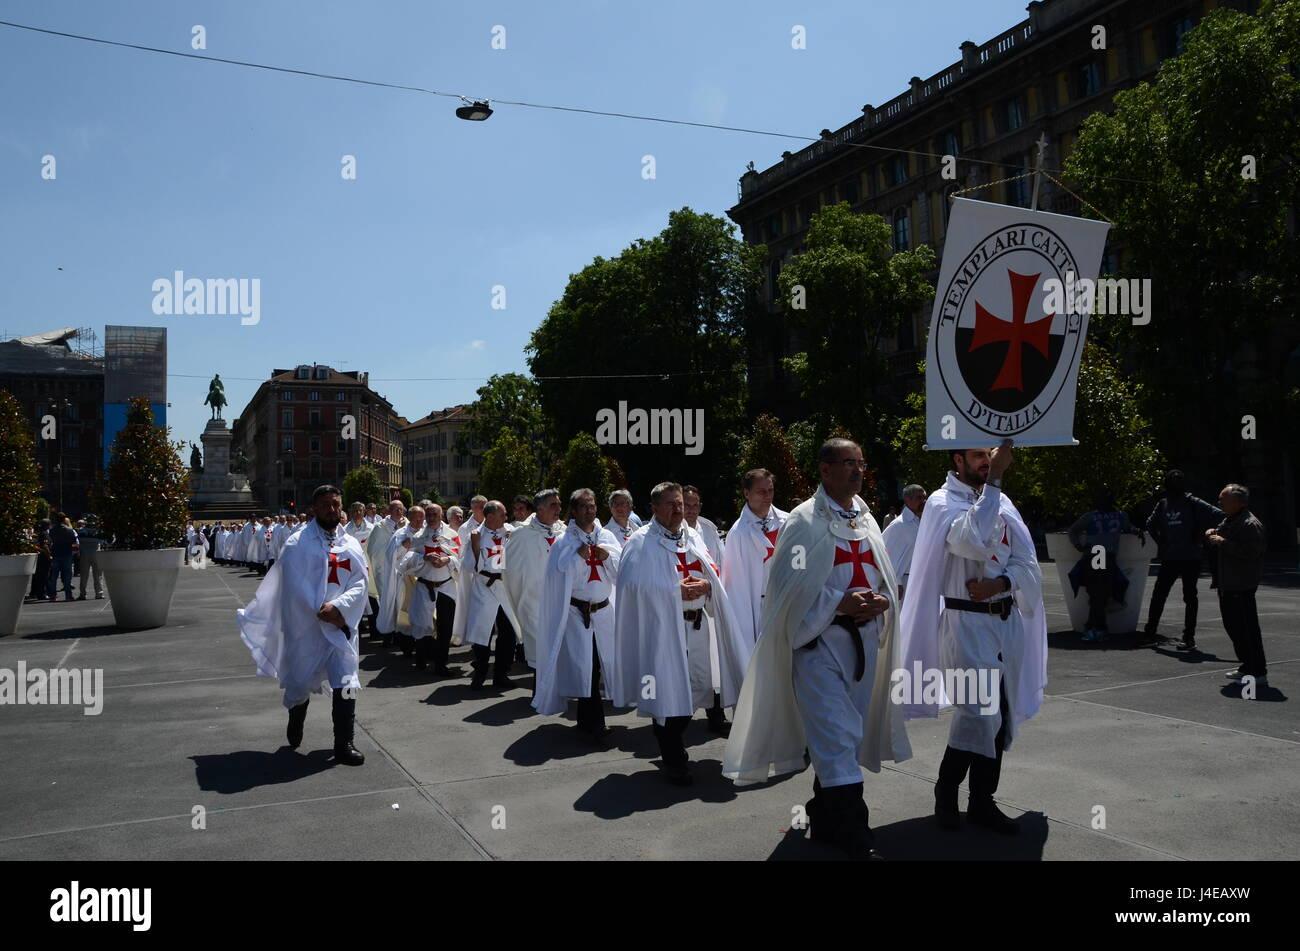 Milan, Italy - May 13th, 2017: Knight Templar (Cavalieri Templari) parade in front of Castello Sforzesco in the Stock Photo